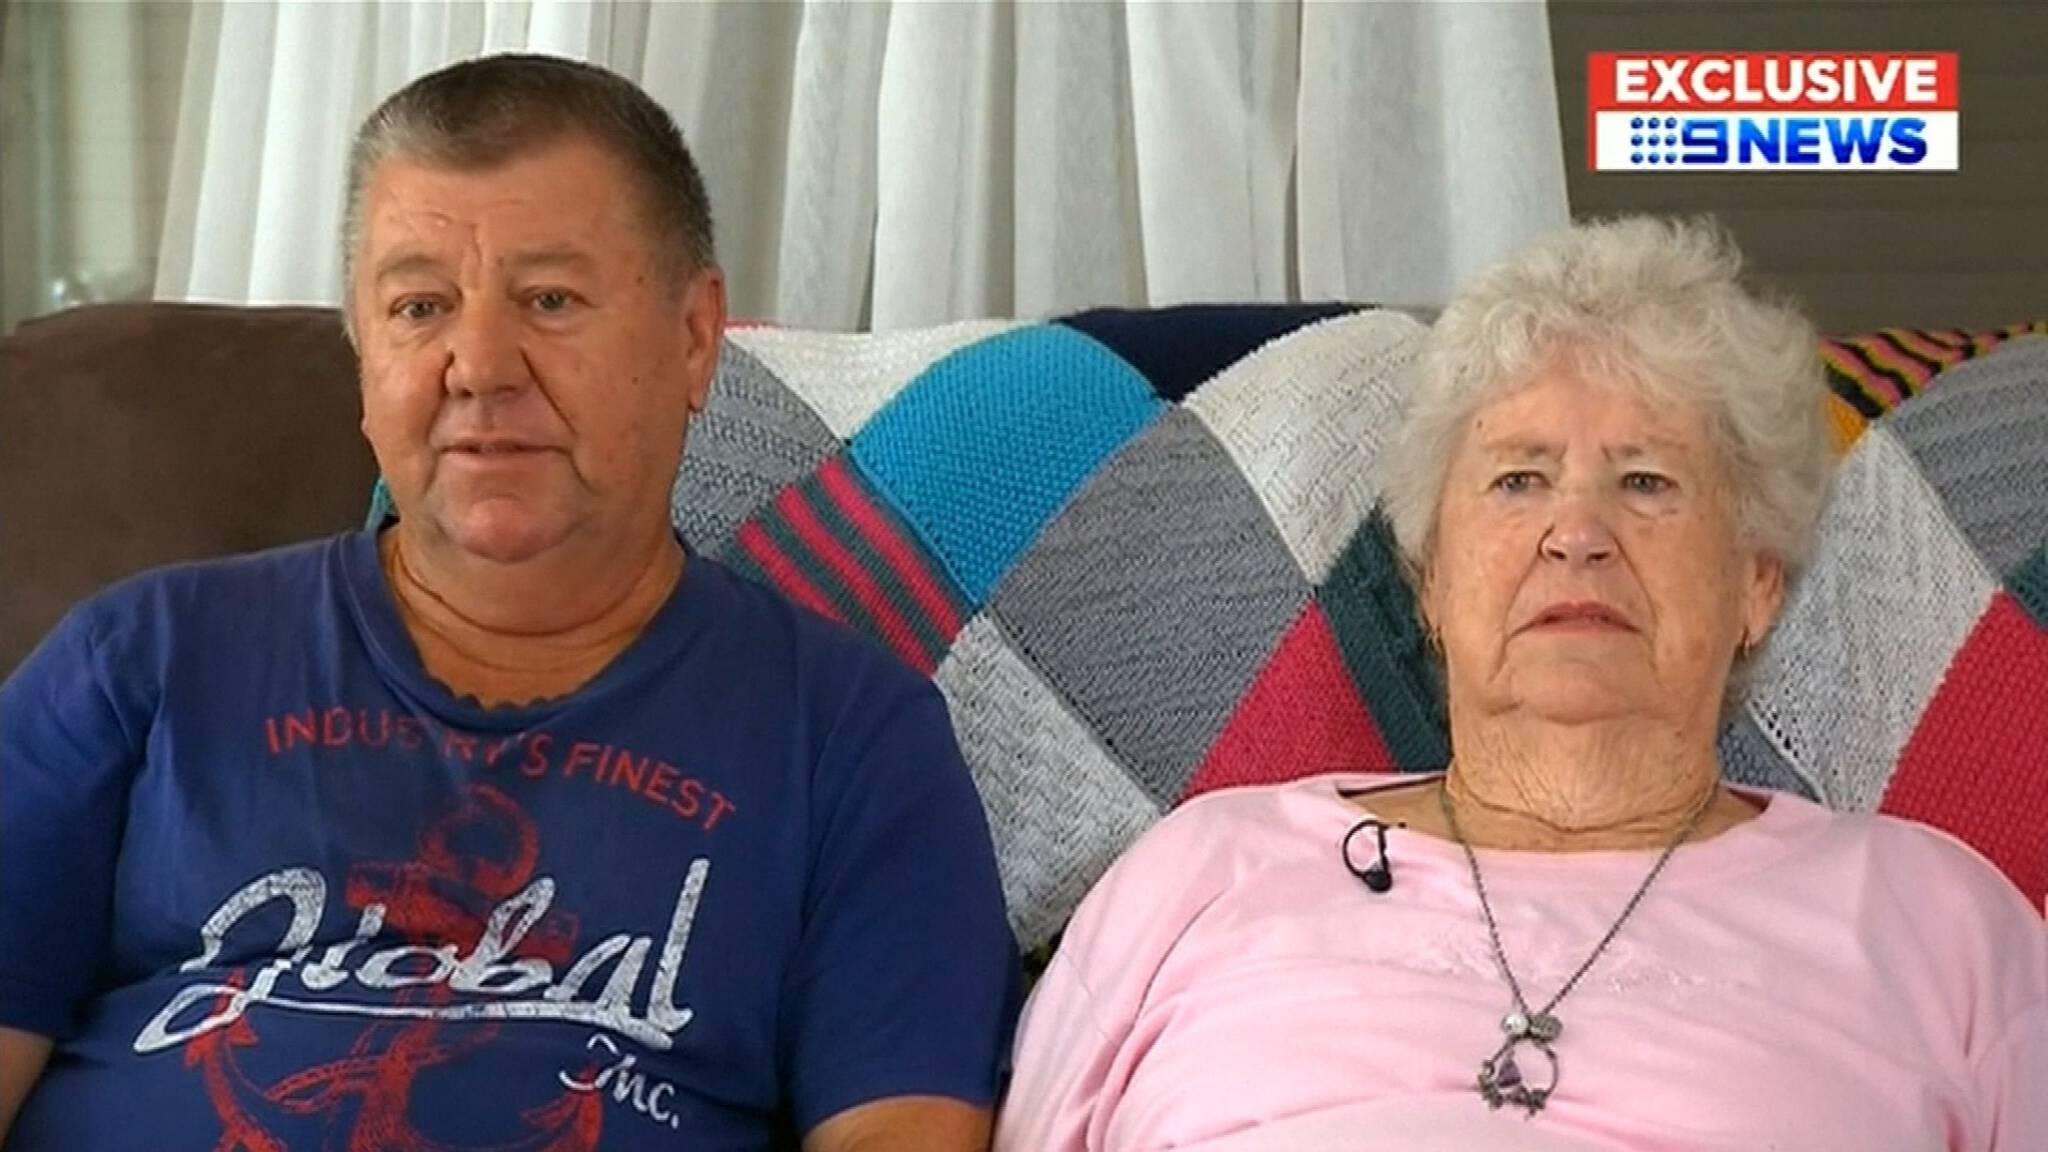 Brenton Tarrant Update: Familie Dader Christchurch: We Zijn Stomverbaasd